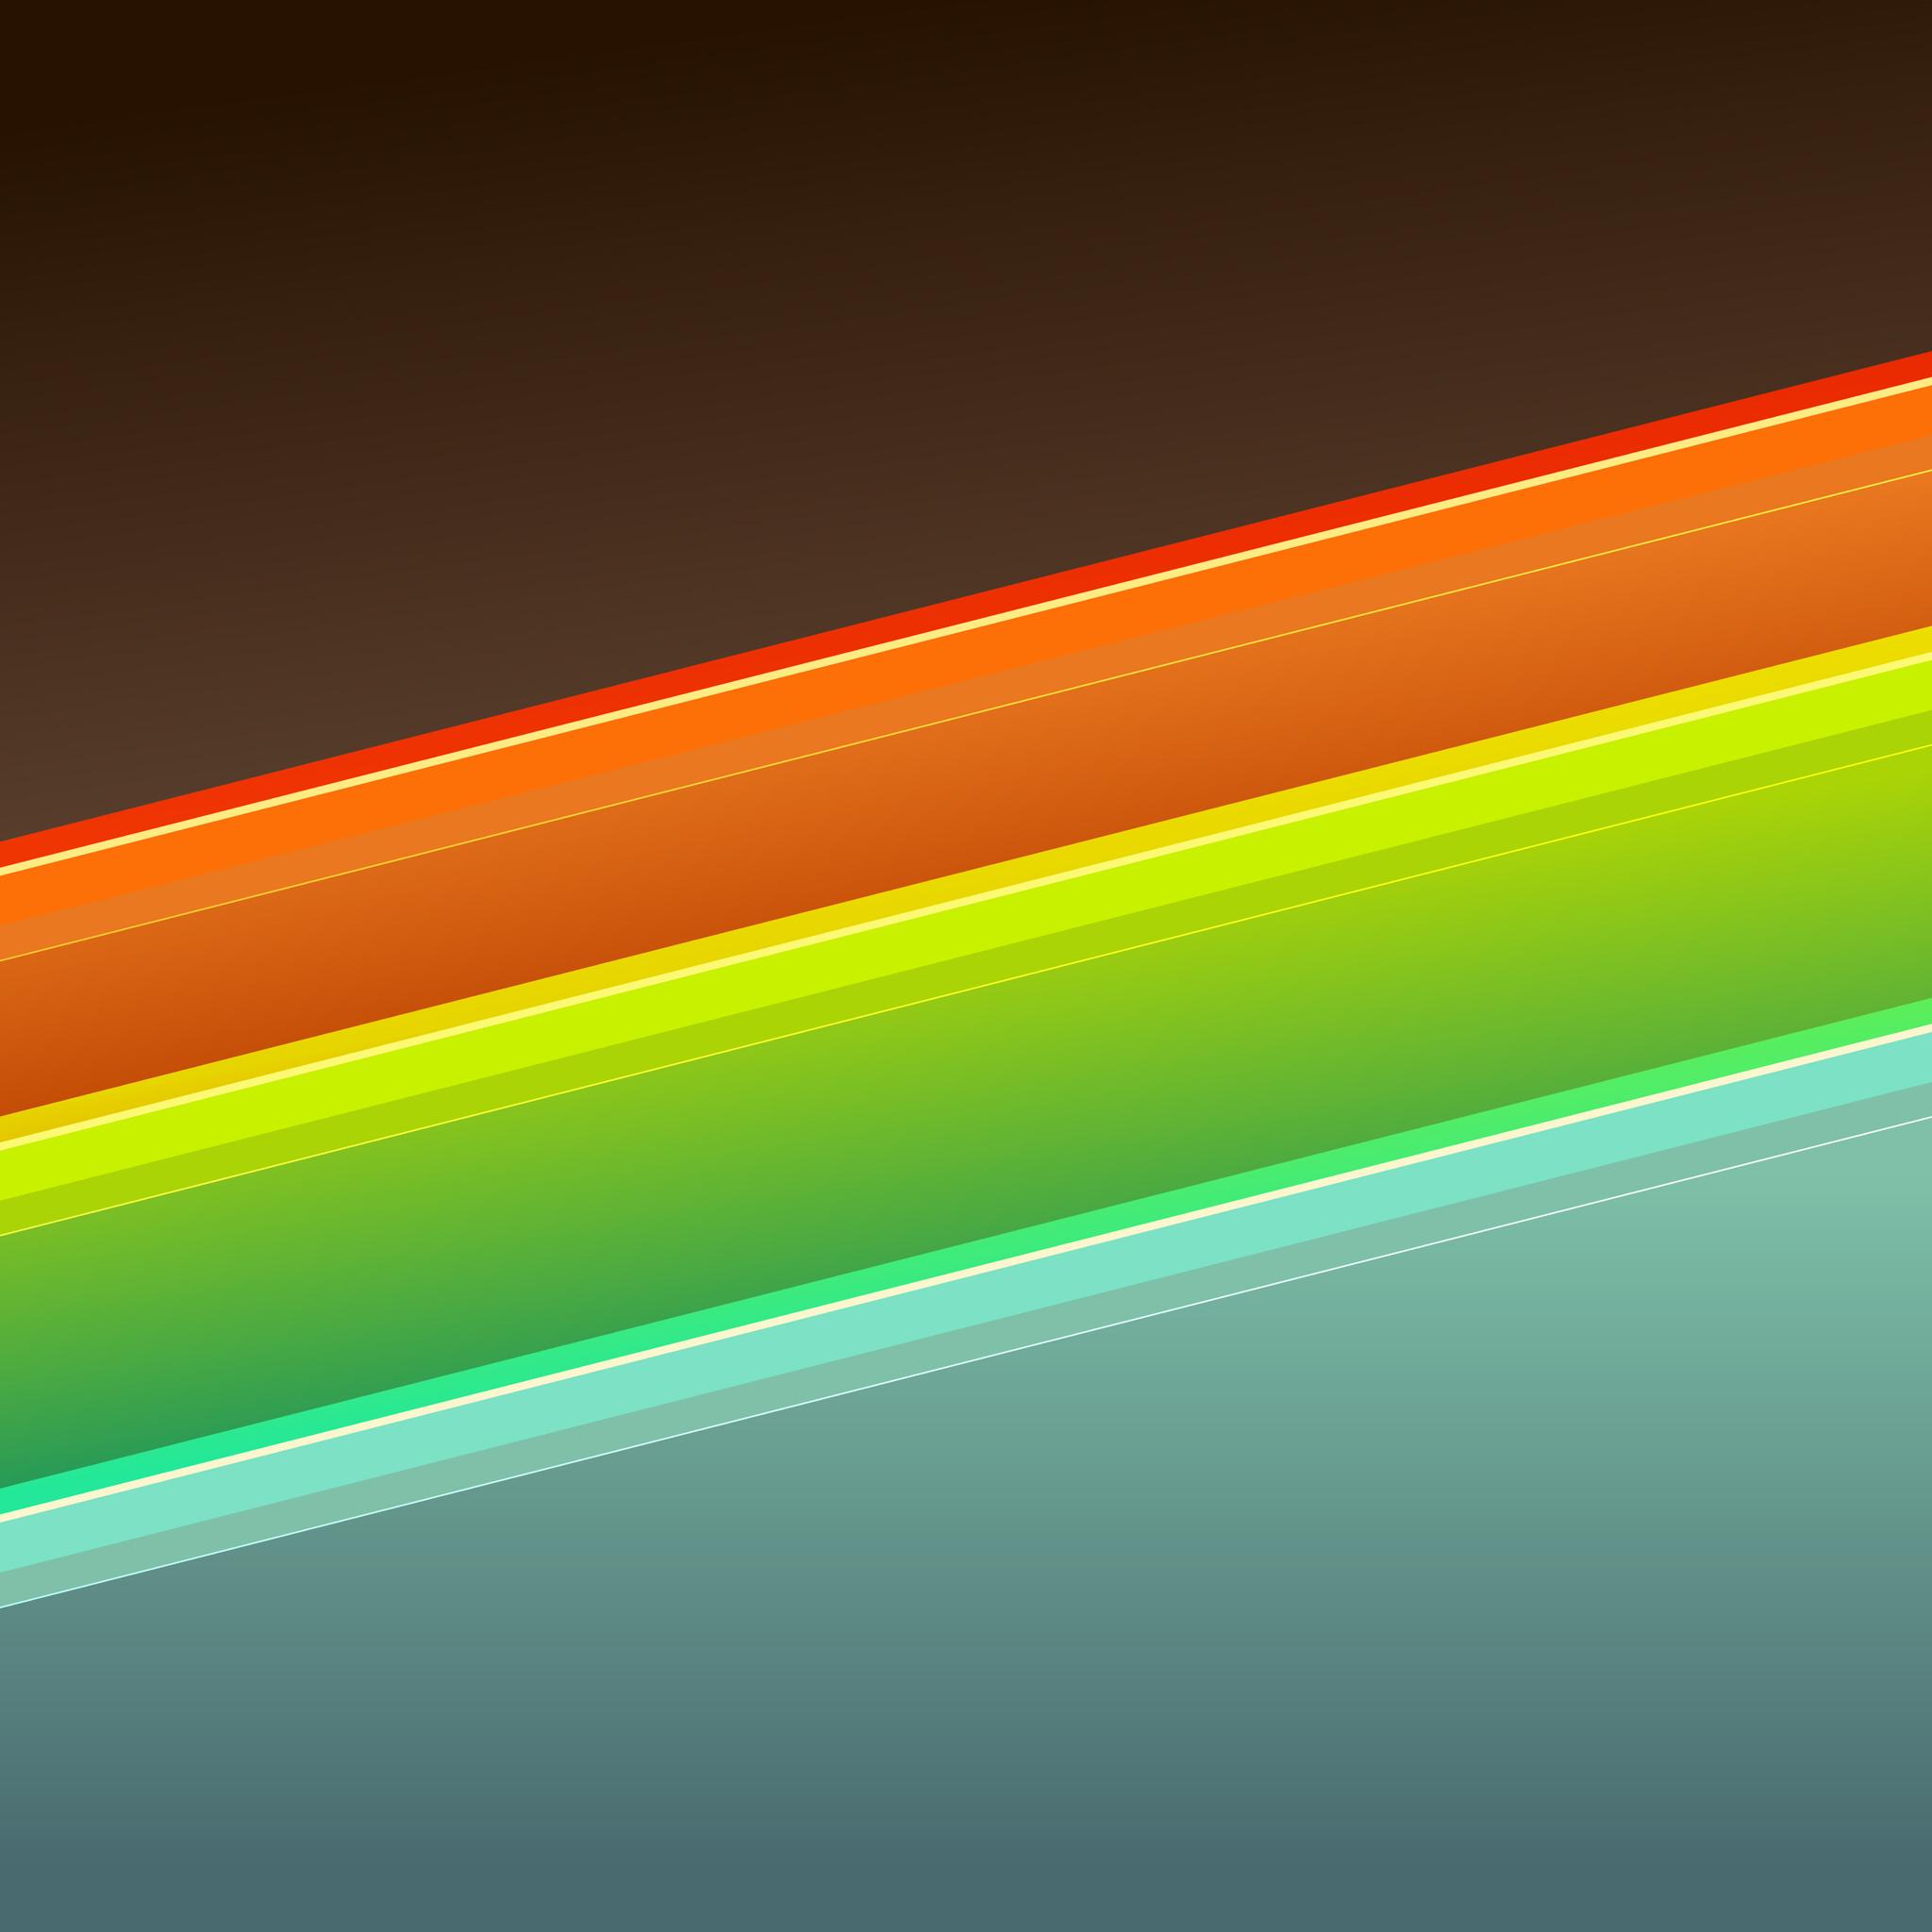 duckfarm - spectrum abstract ipad wallpaper